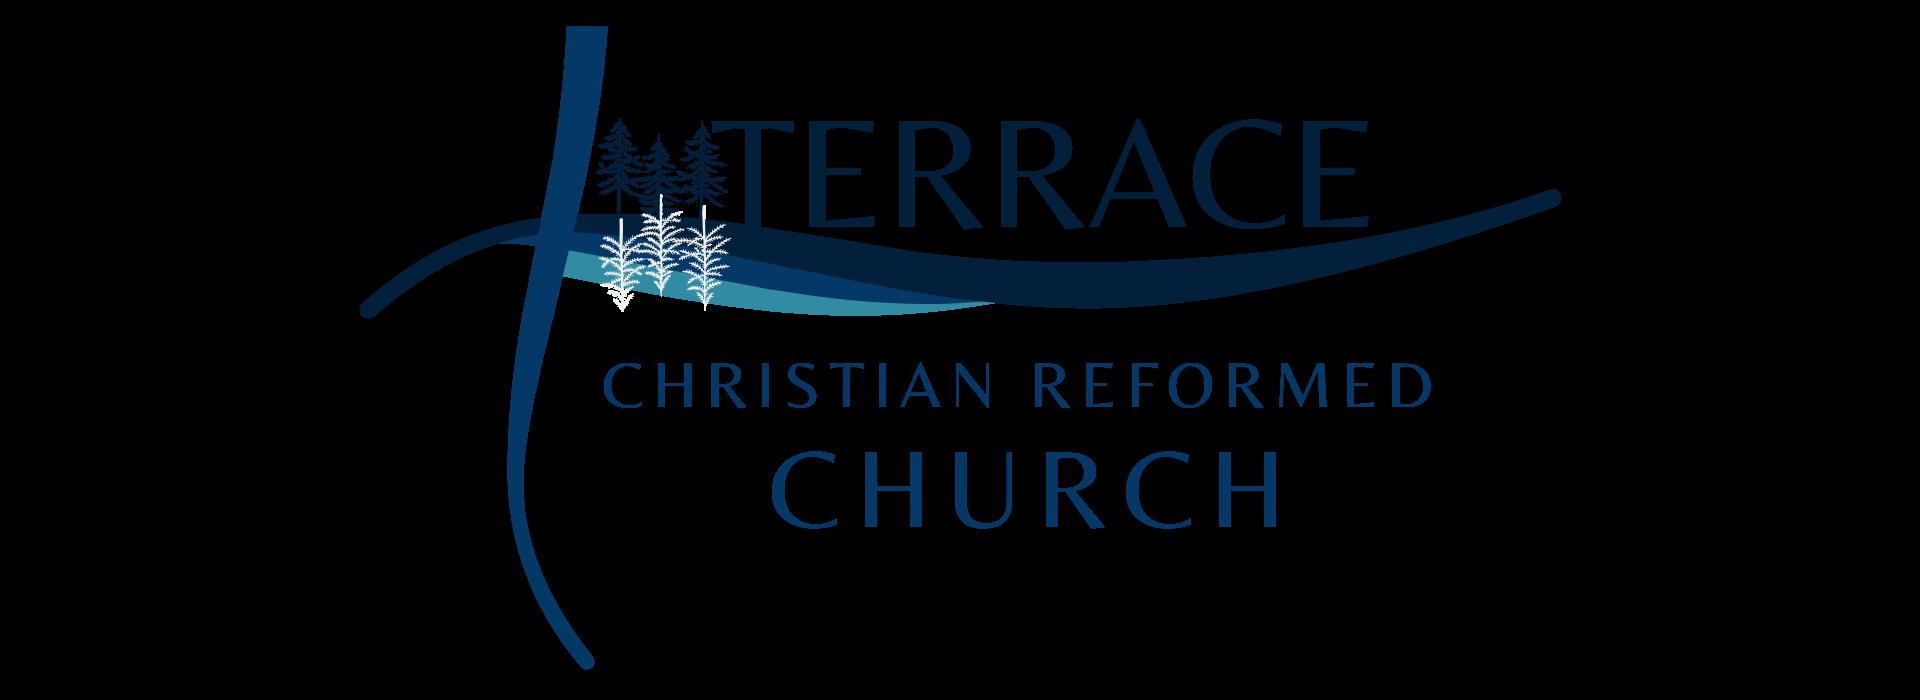 Terrace Christian Reformed Church